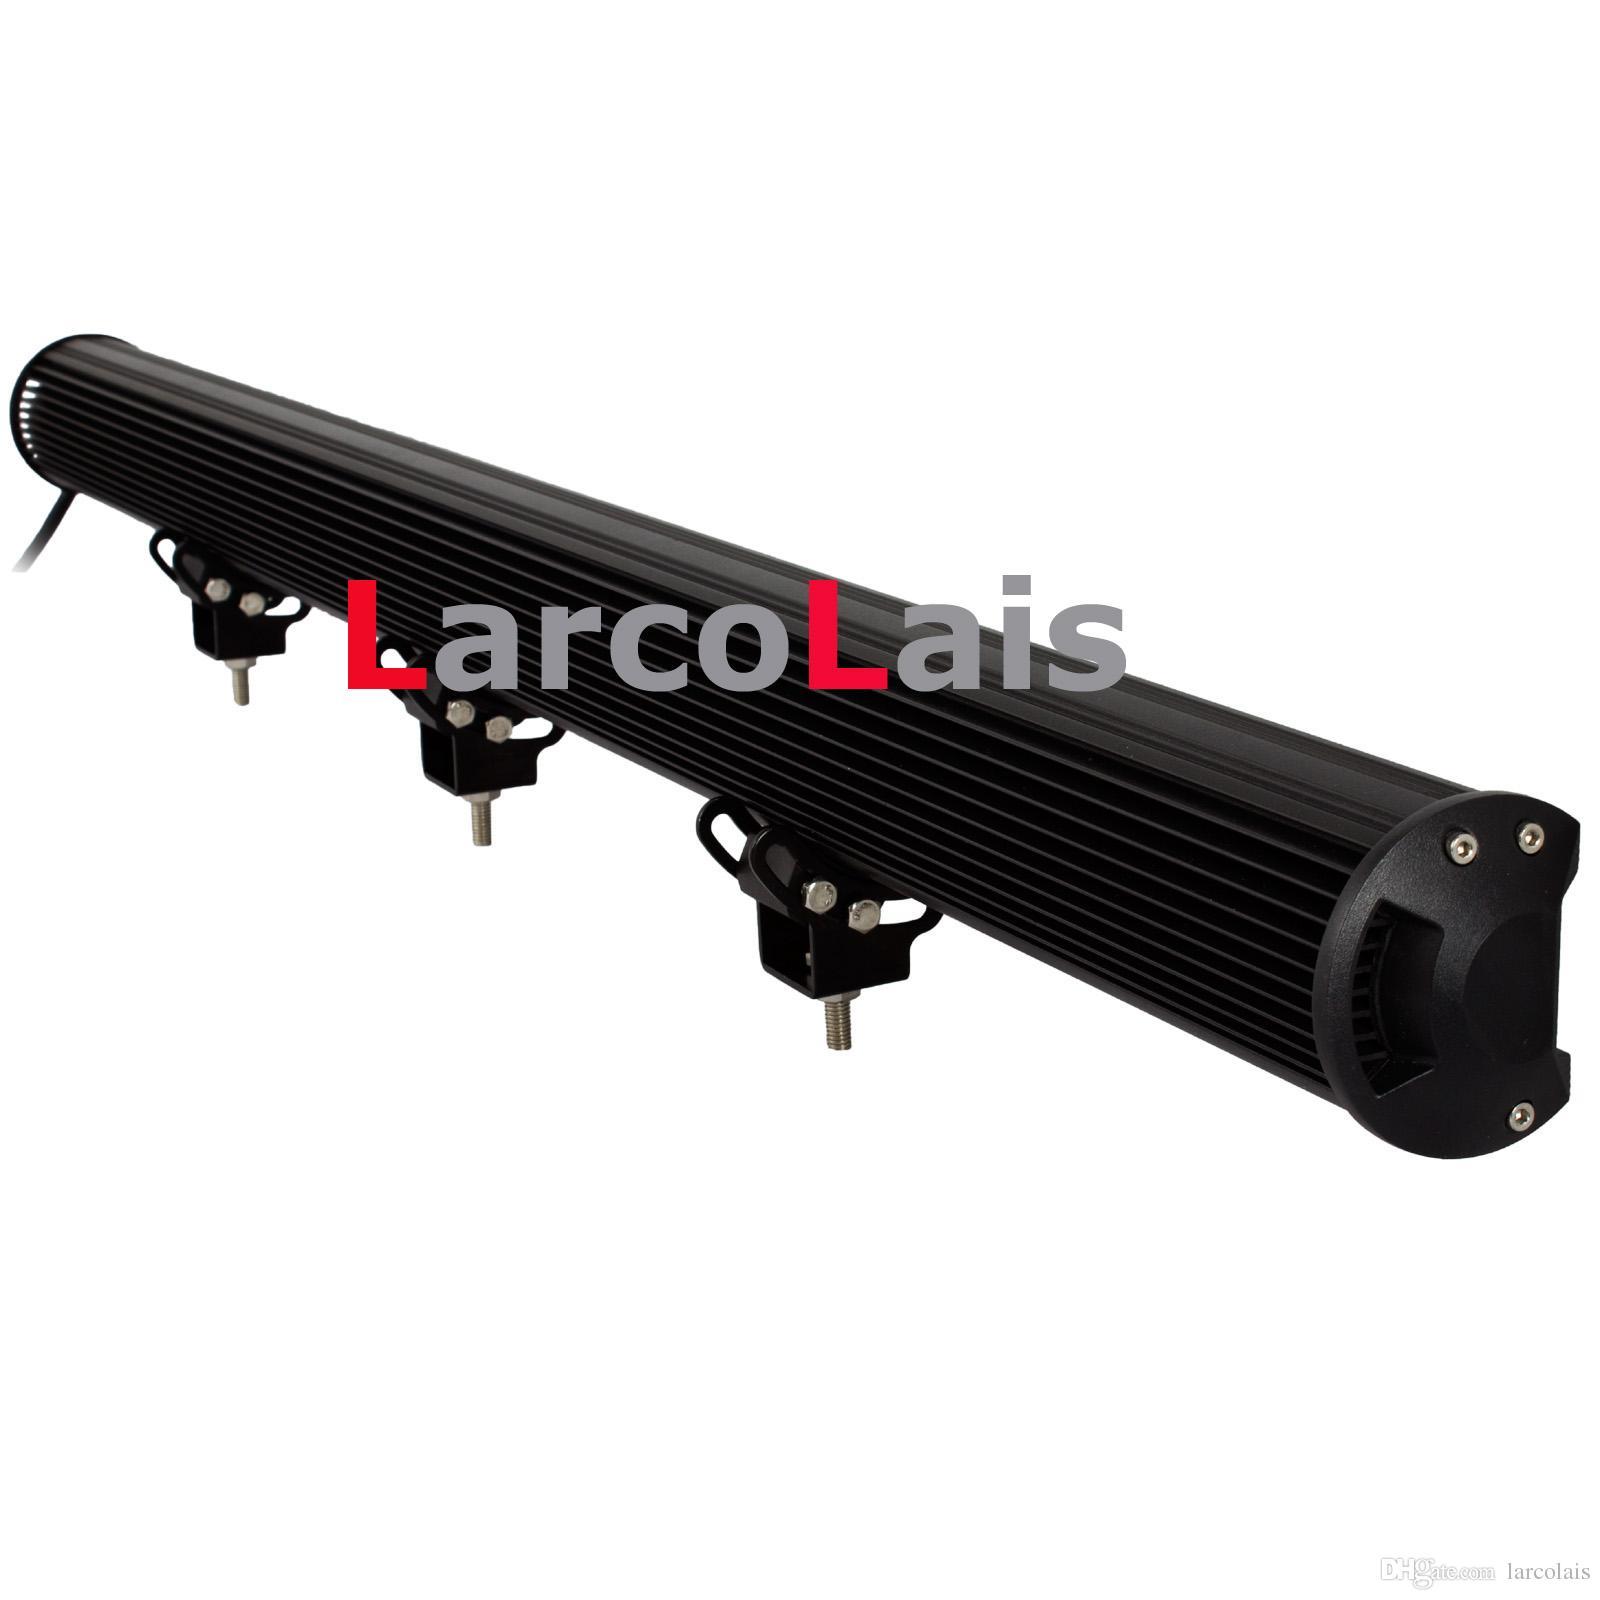 43 pulgadas 288W CREE LED Light Bar Jeep Truck Trailer 4x4 4WD SUV ATV Off-Road Car 12v 24v Trabajo Lámpara de trabajo Lápiz Haz extendido